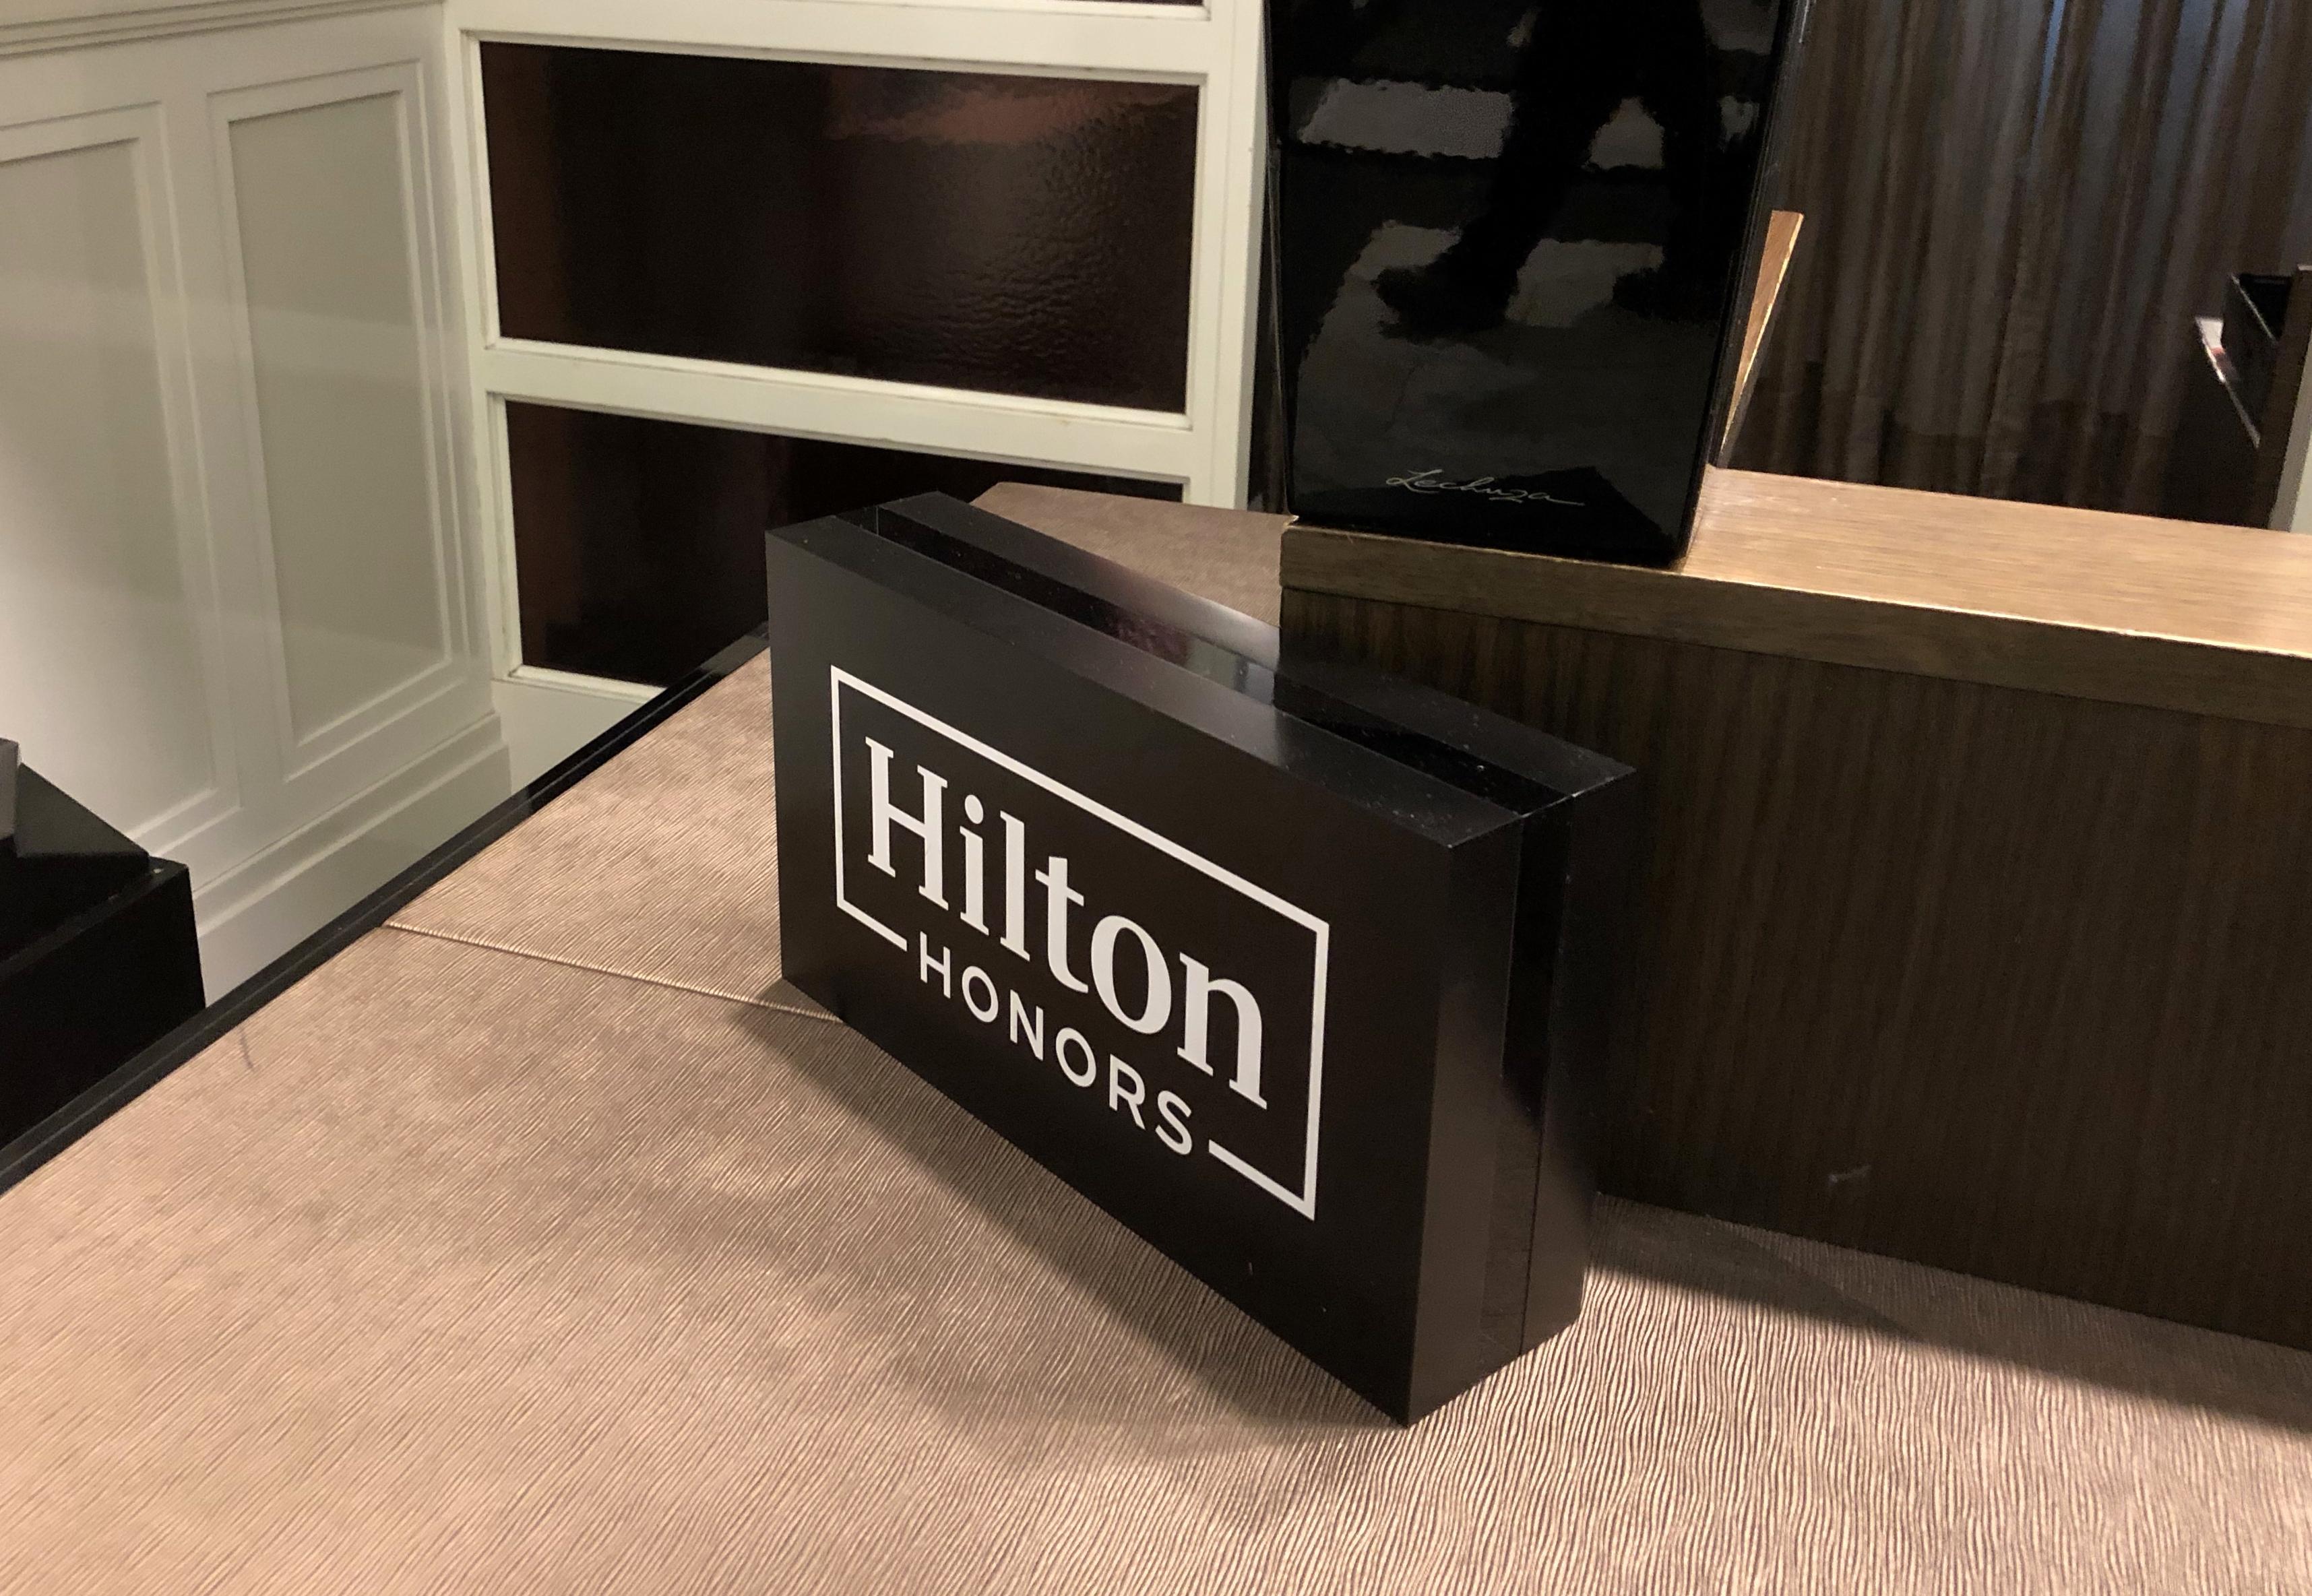 Hilton Honors Status Match mit Chance auf Challenge